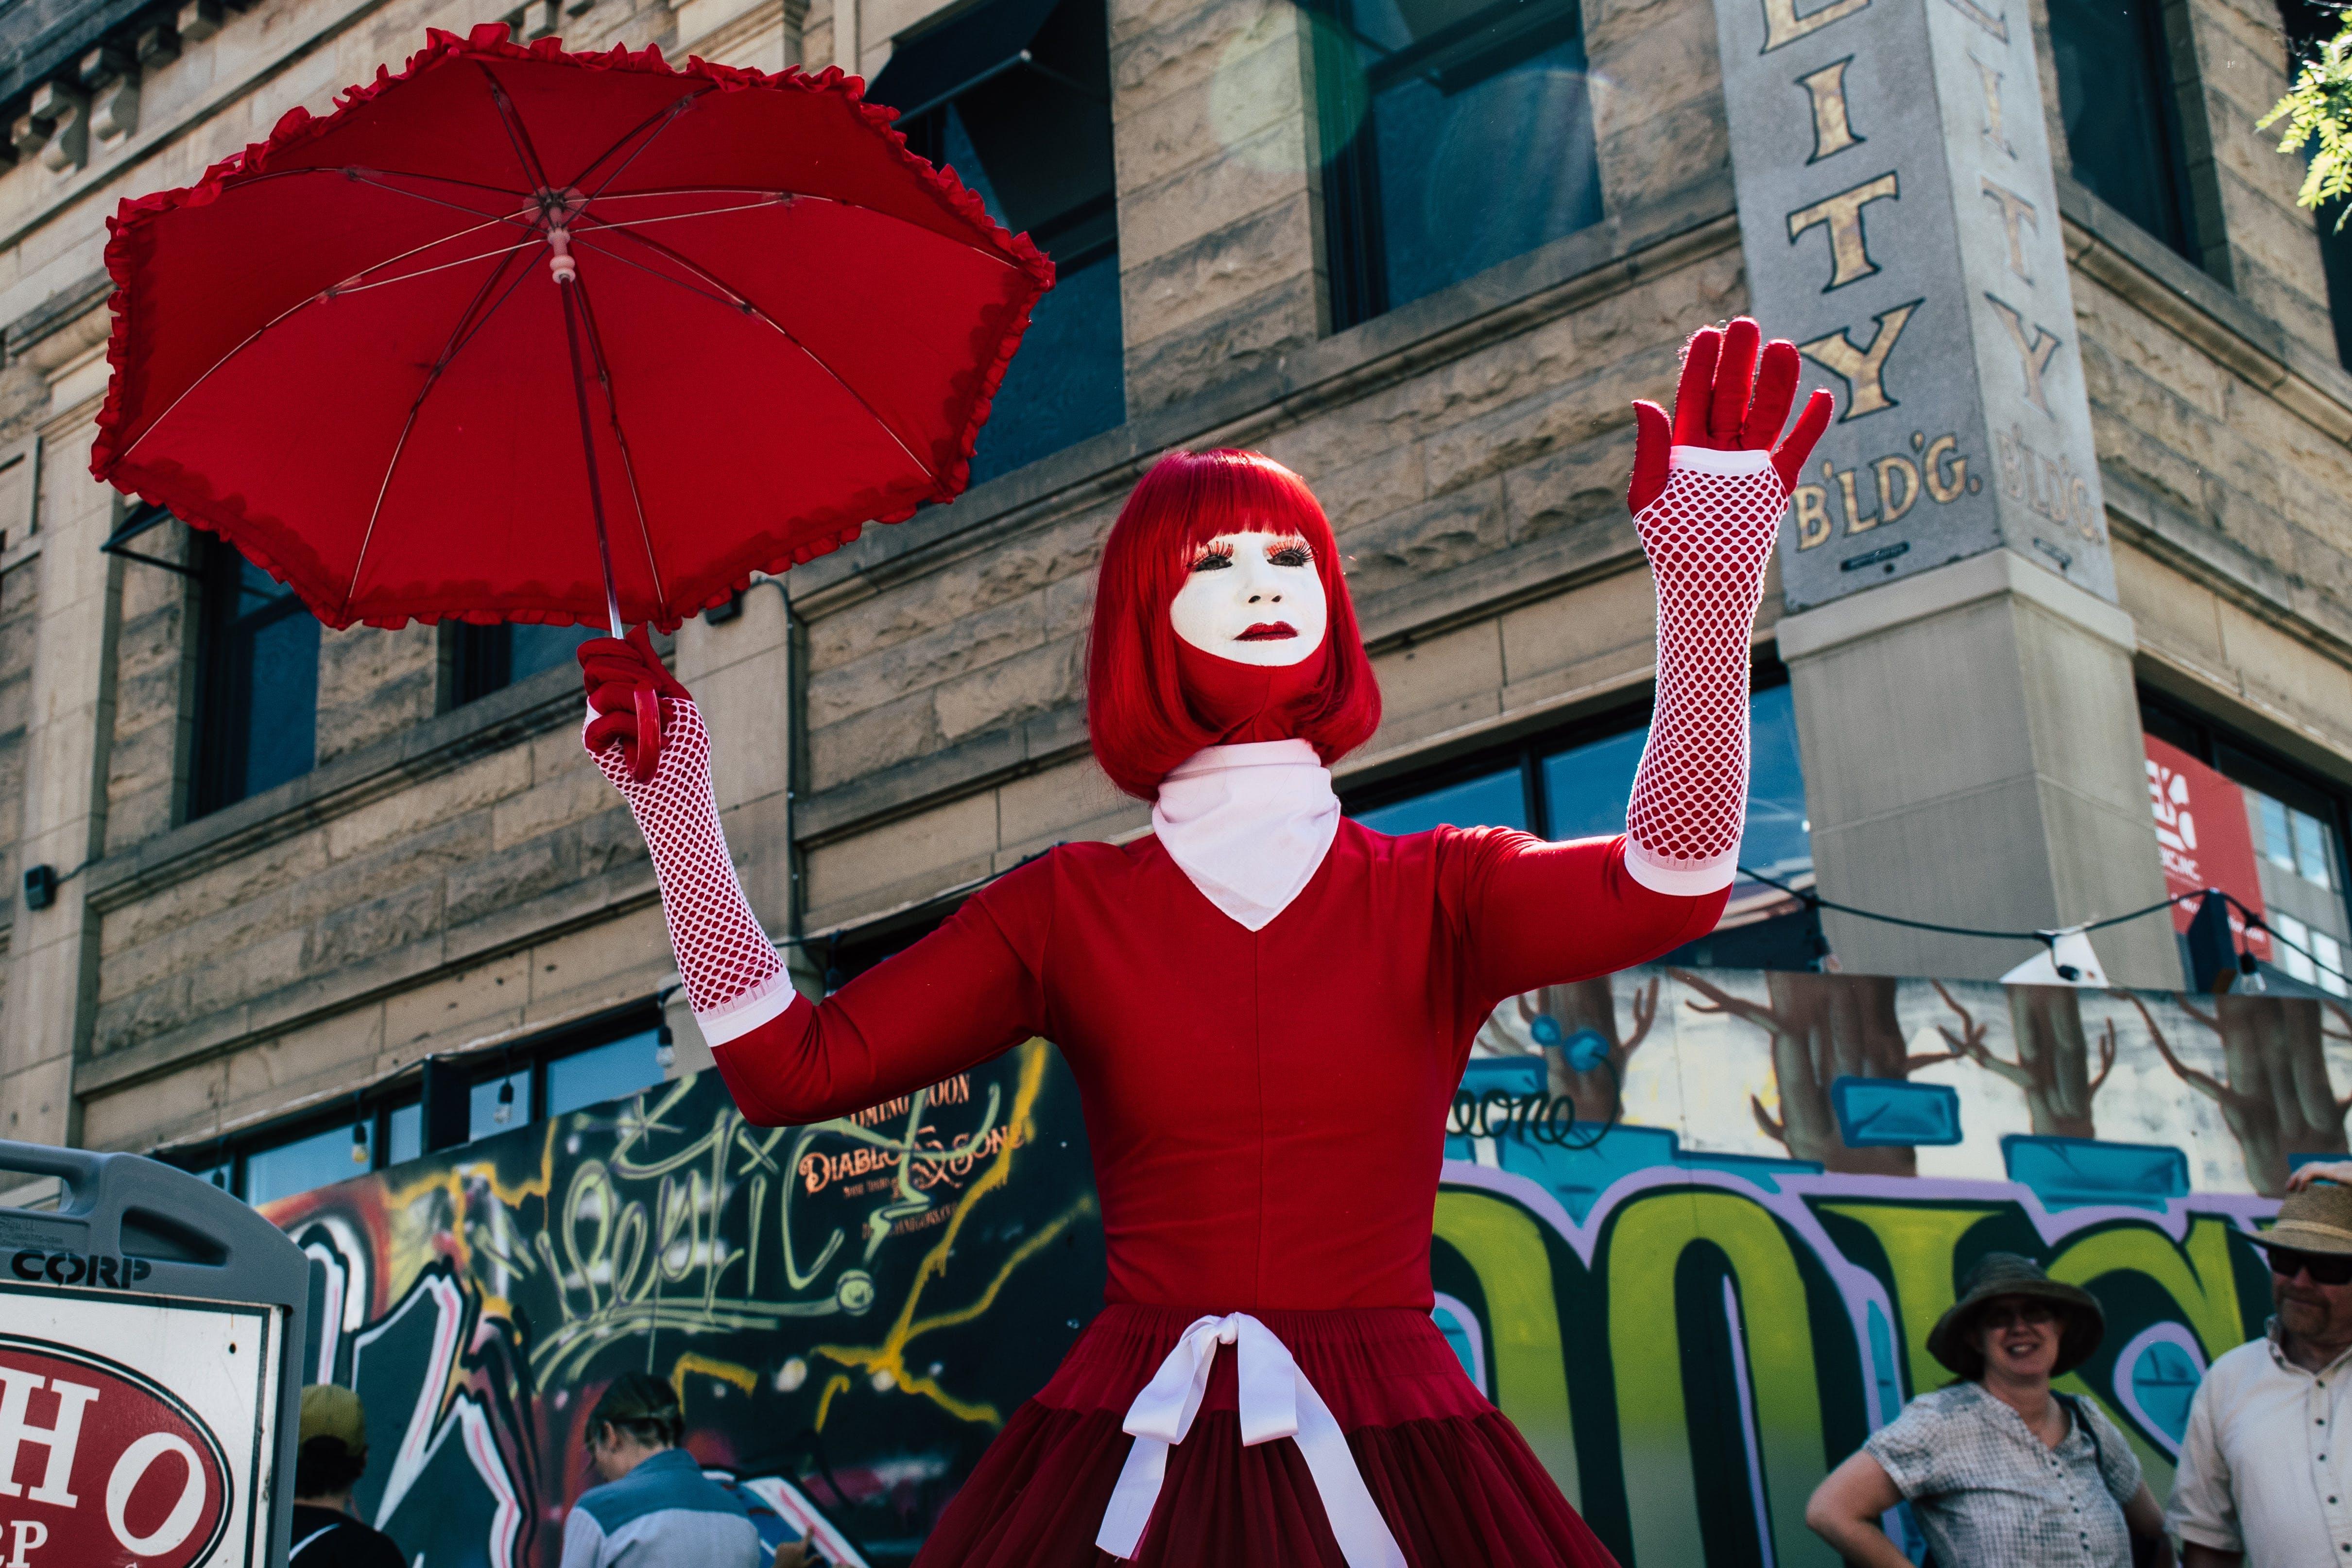 Woman Holding Red Umbrella